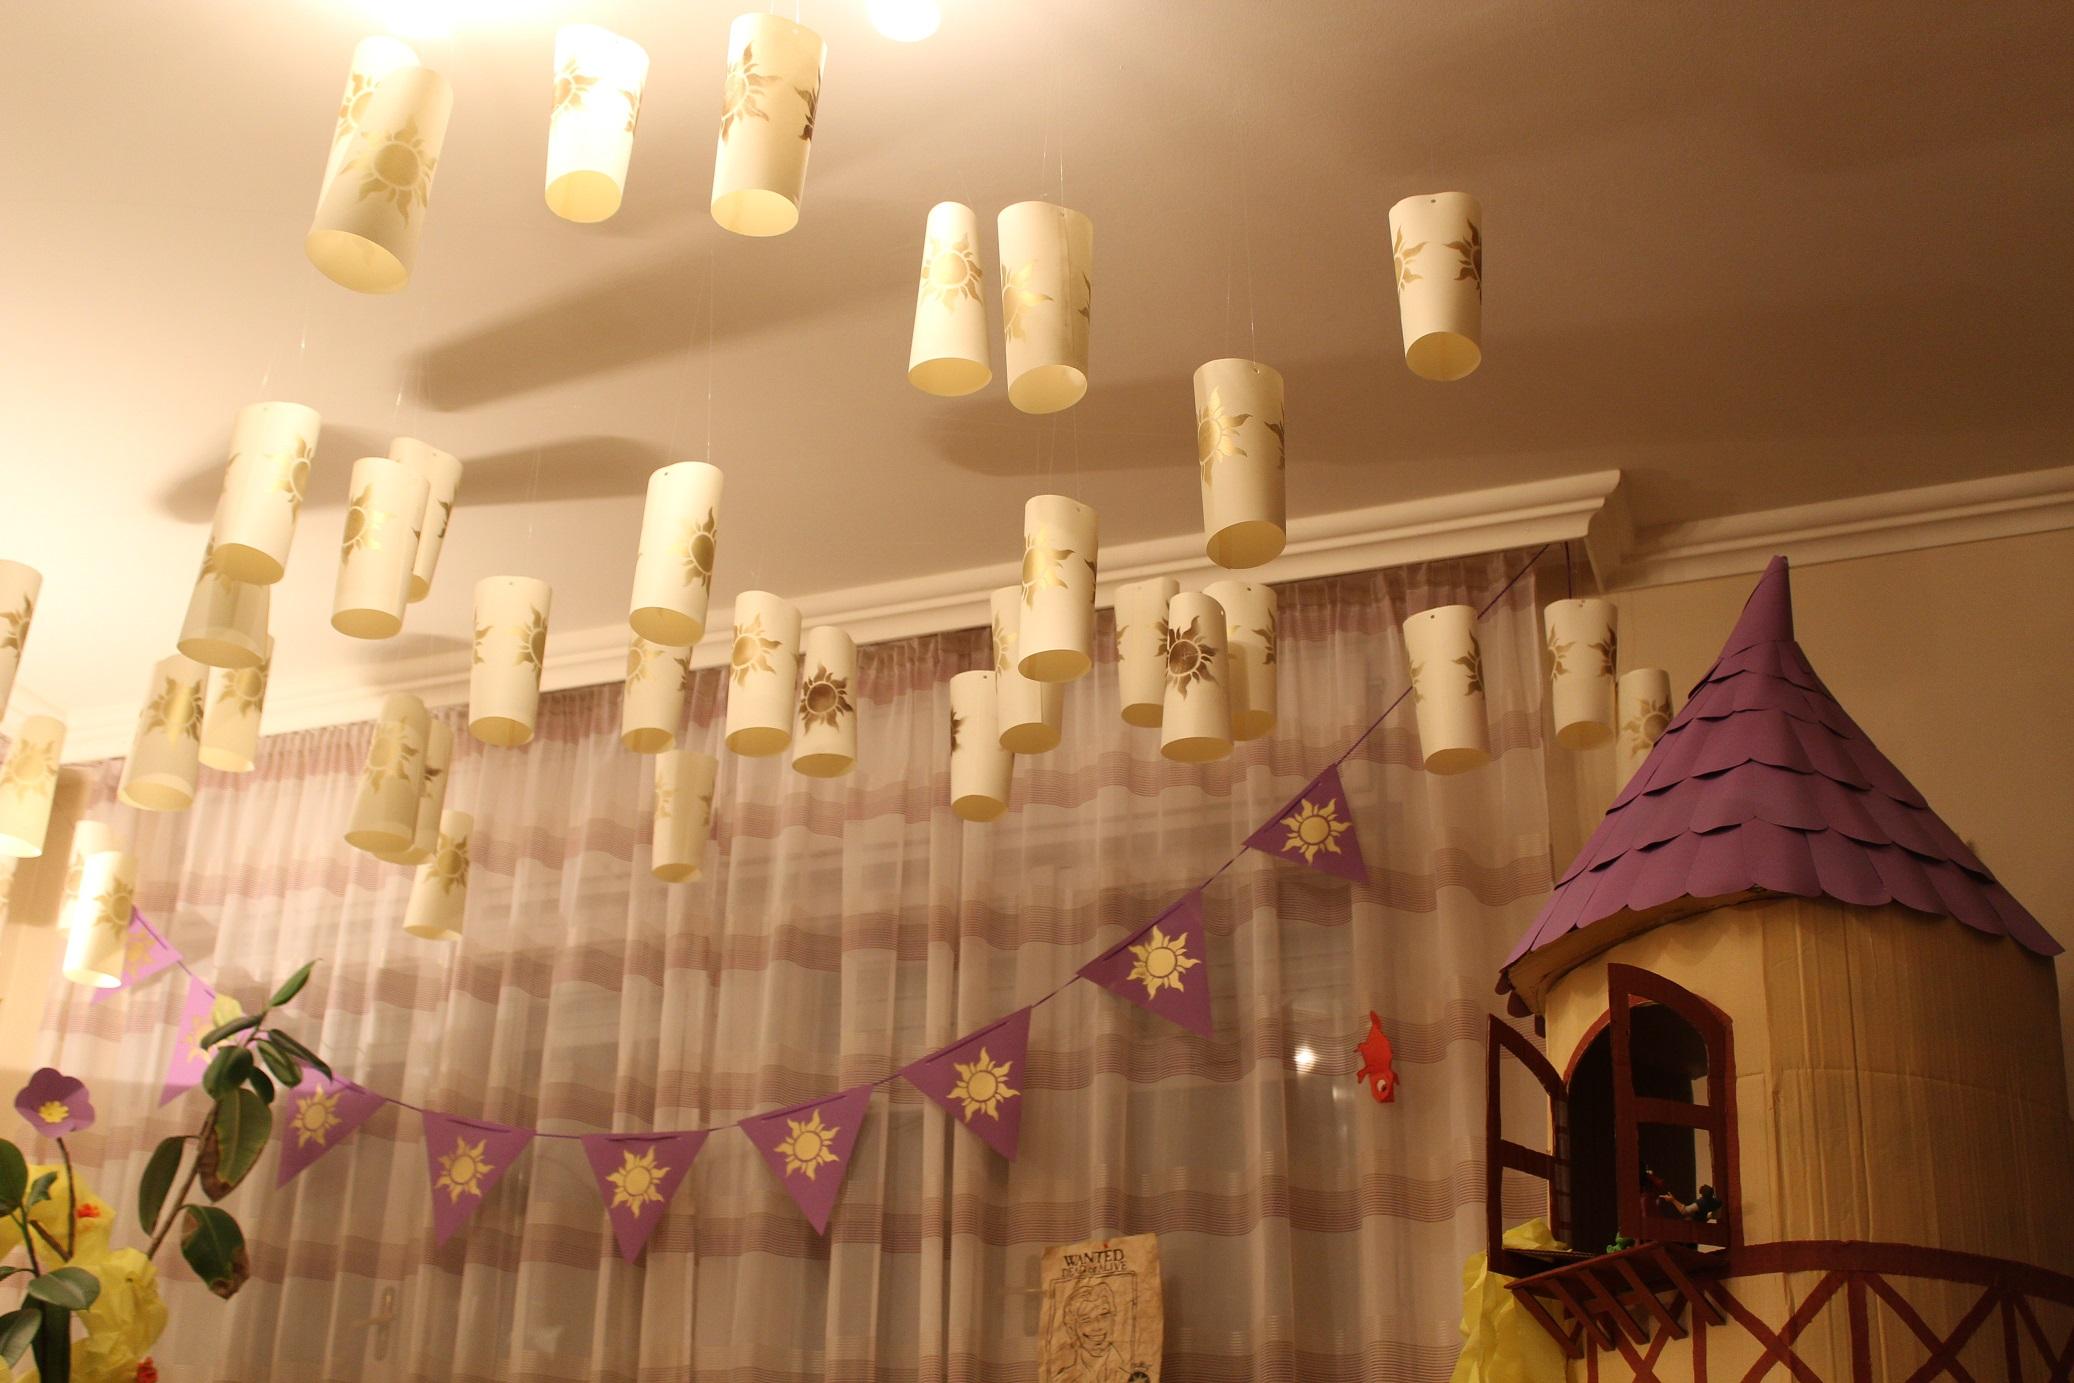 szmk_tangled_aranyhaj_birthday_party_szulinap_dekor_buli_3.JPG